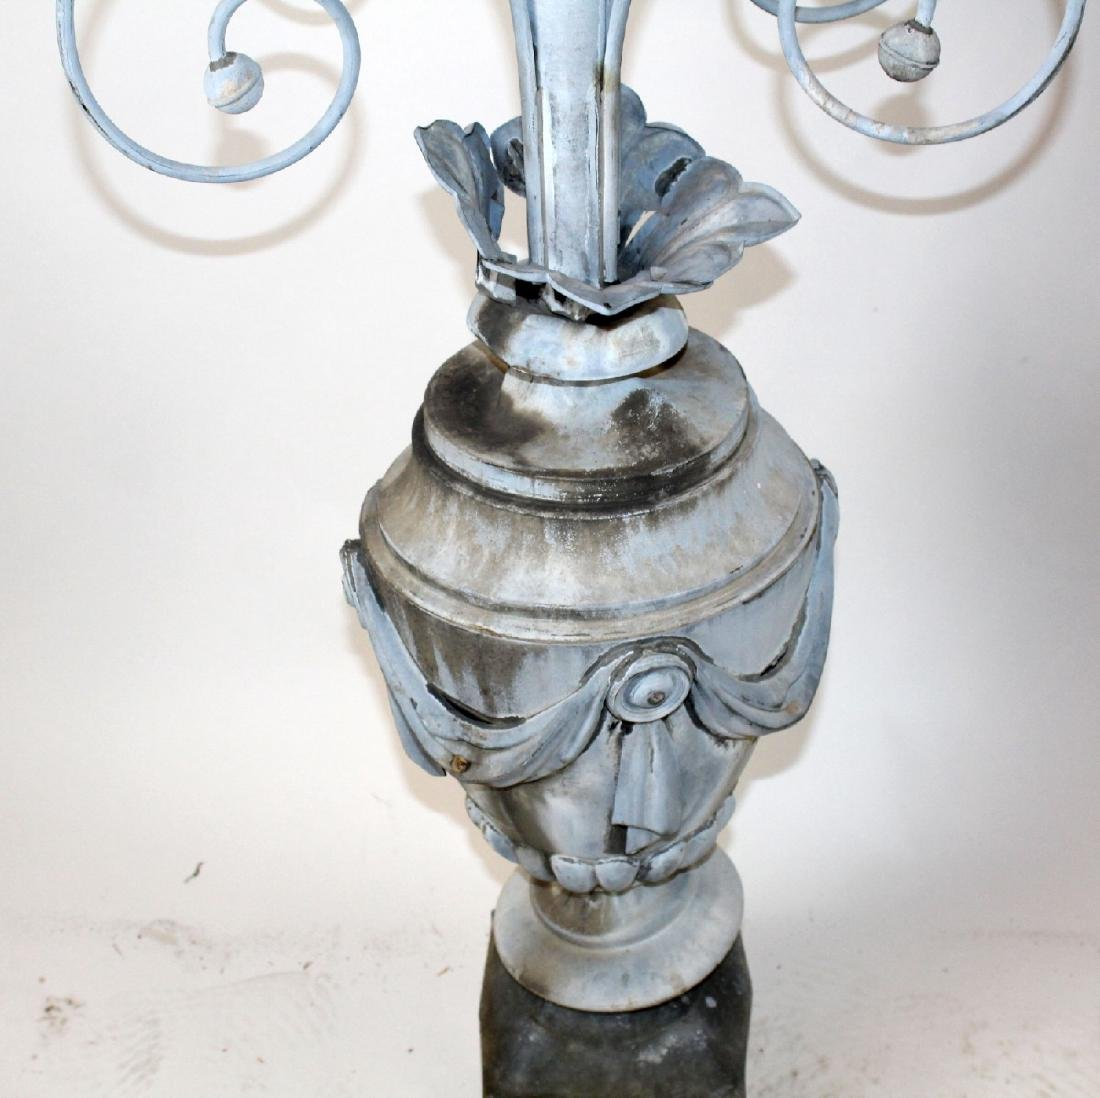 French 19th century zinc weathervane - 4